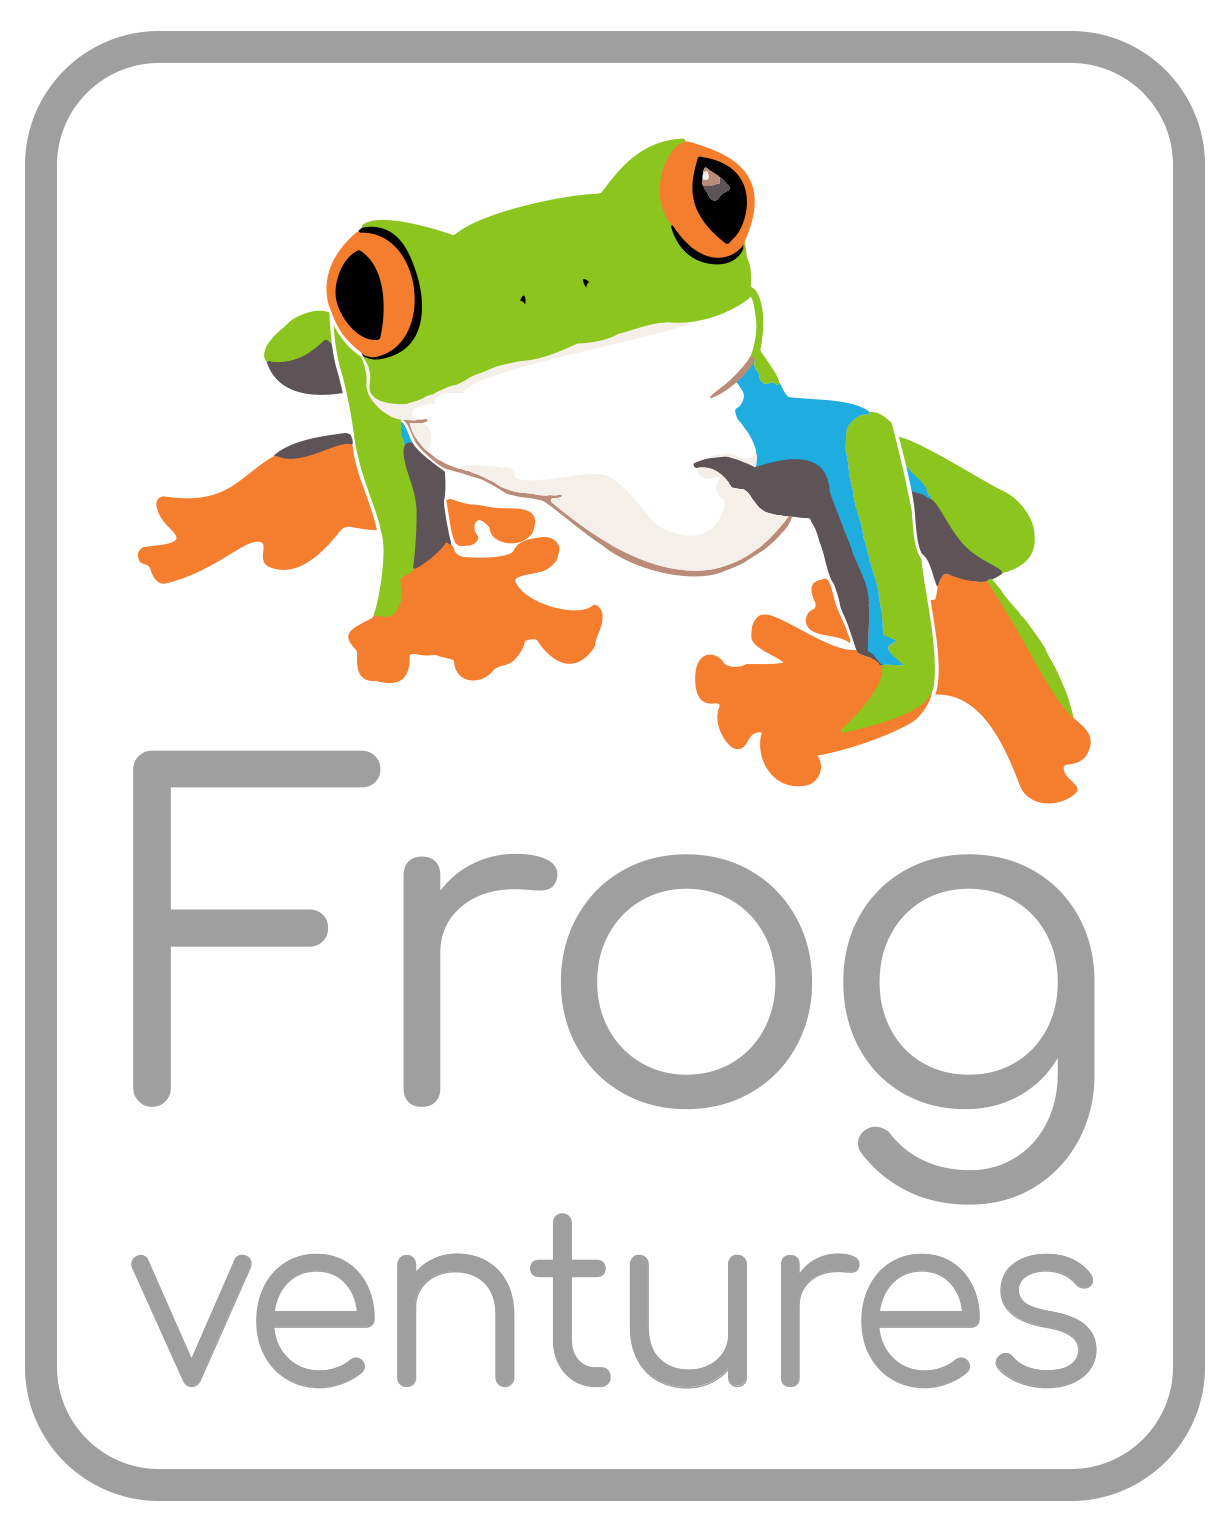 Frog Ventures, LLC Logo